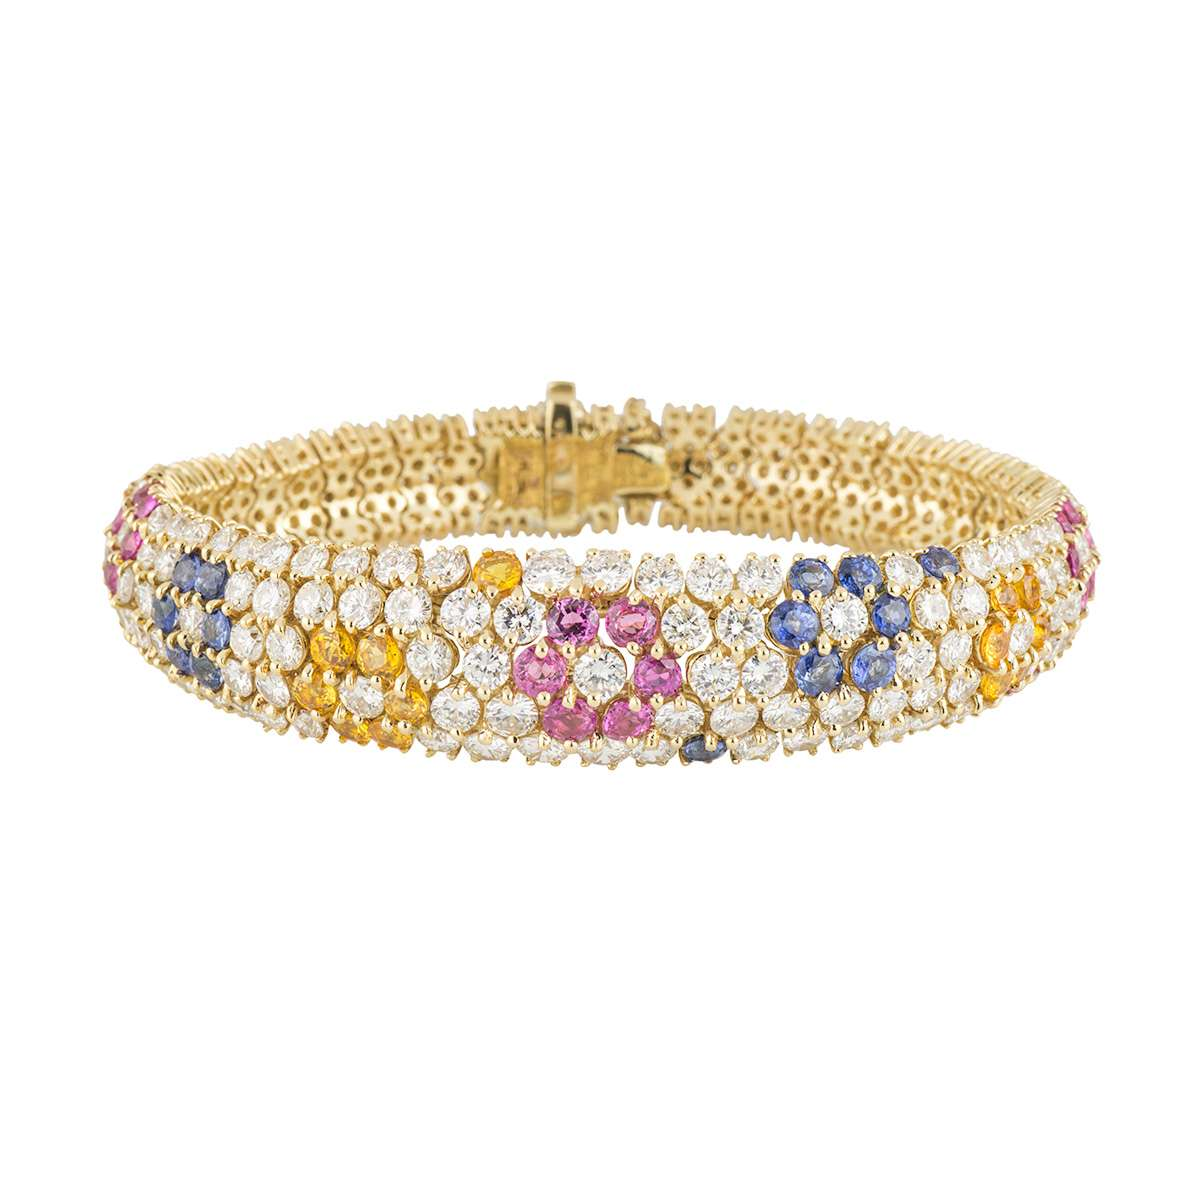 Yellow Gold Diamond and Gemstone Bracelet